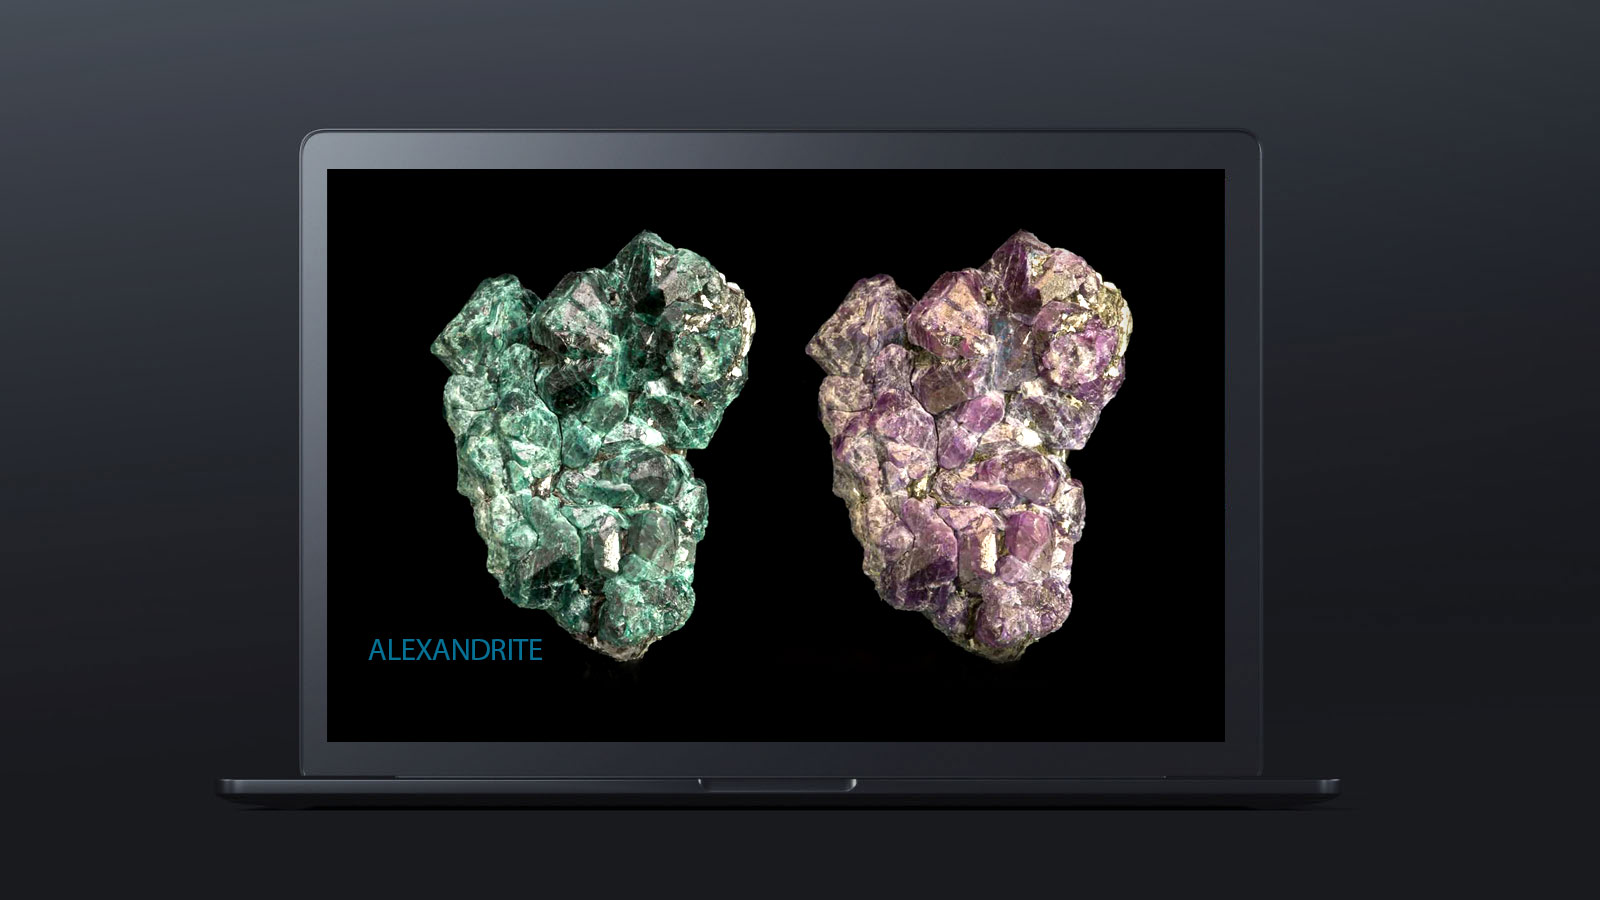 10 worlds rarest gemstones ALEXANDRITE 1 - ده گوهر کمیاب دنیا کدامند؟